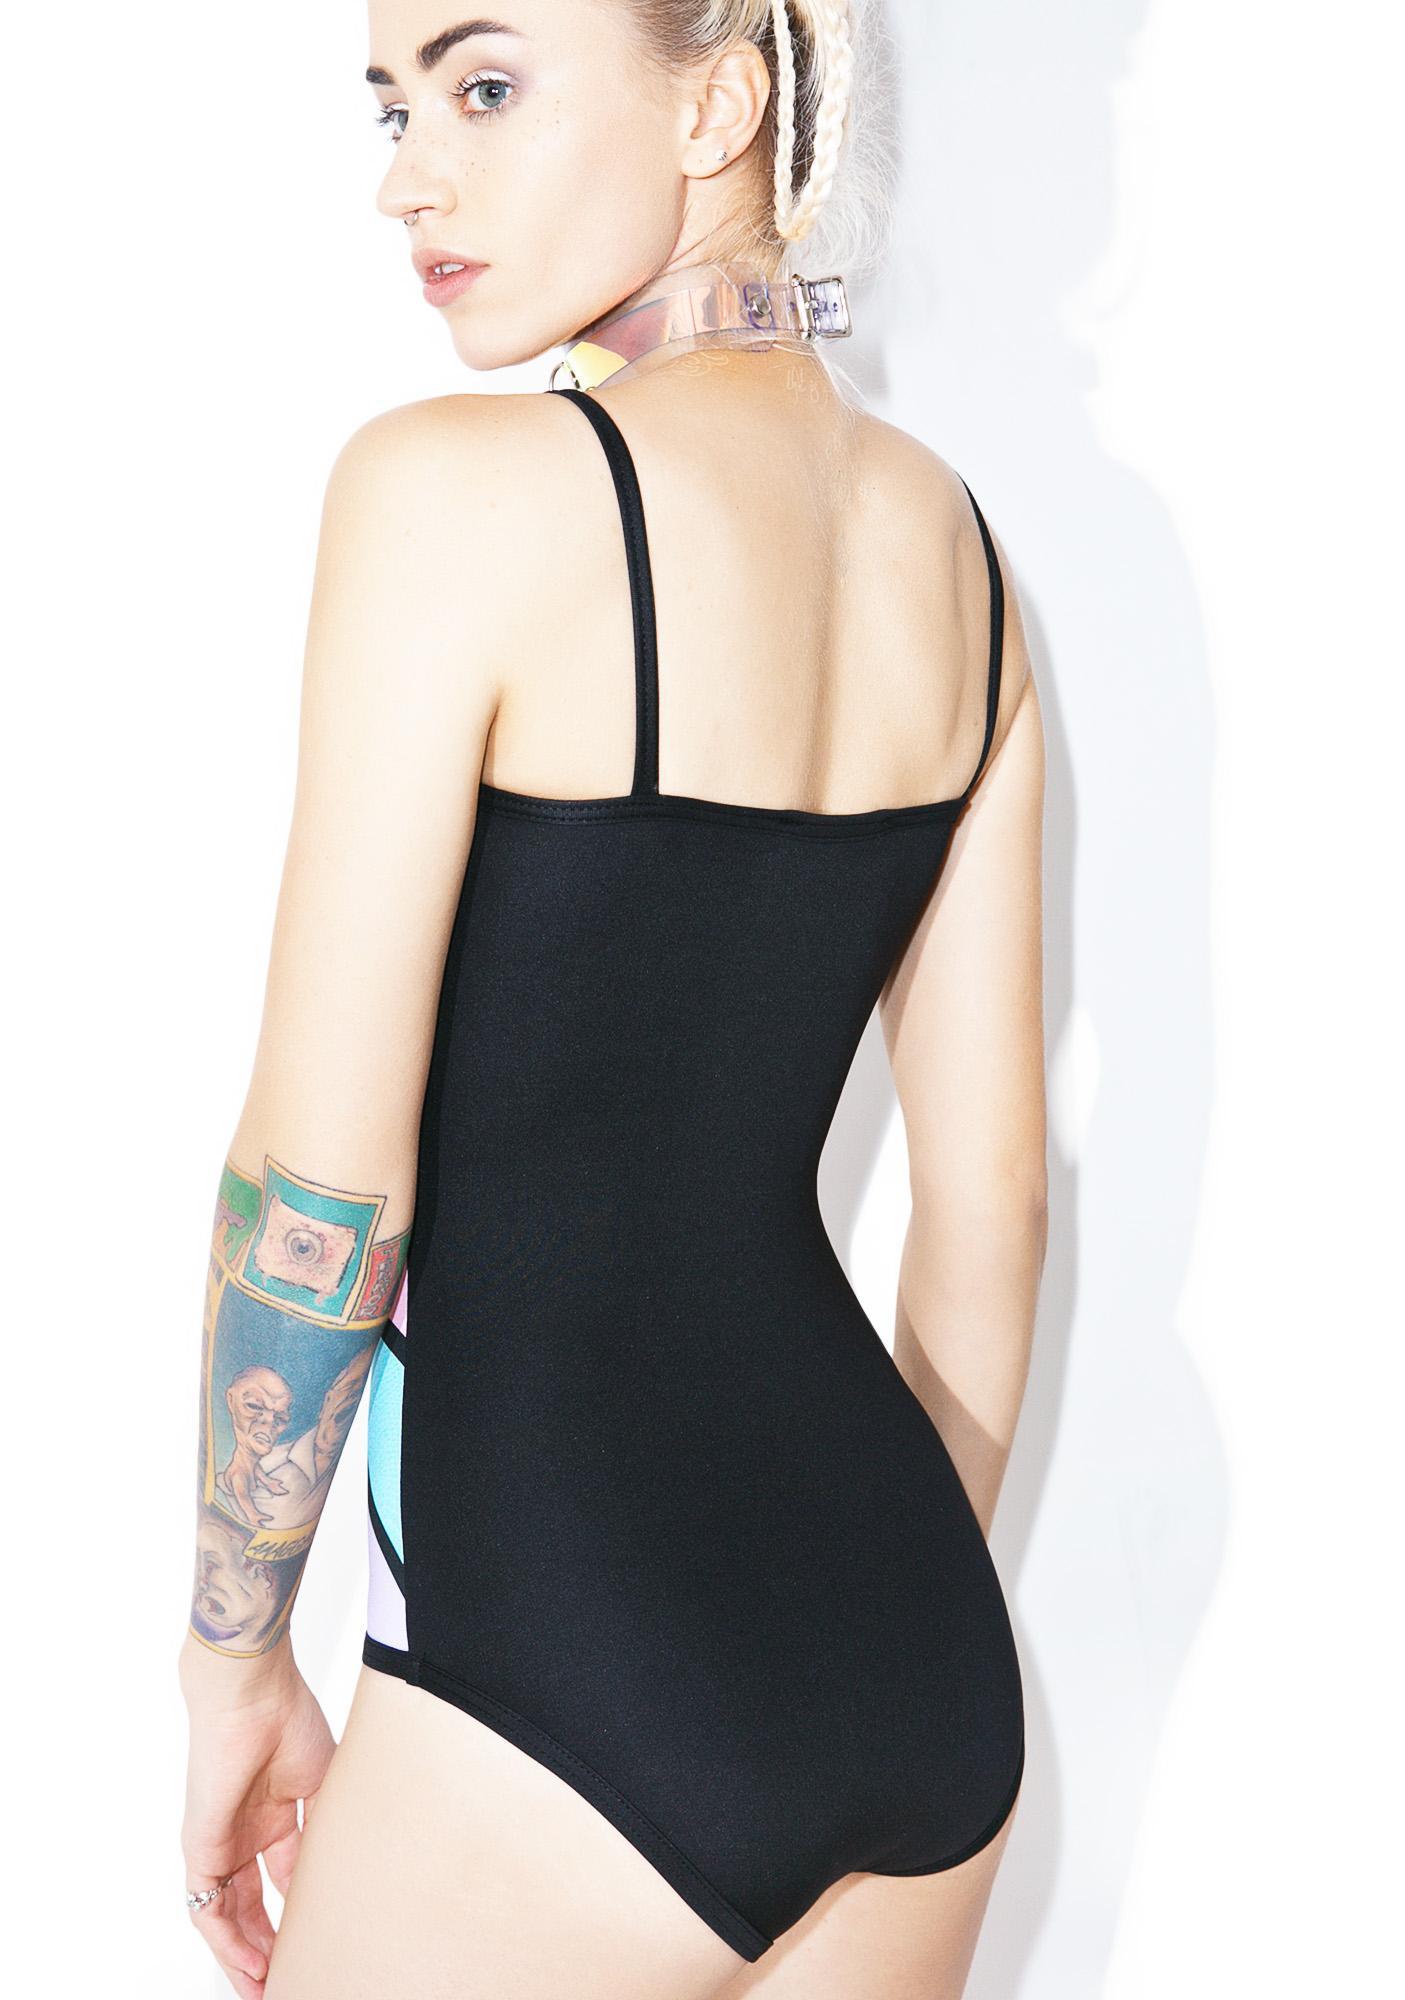 Nympha Affection Bodysuit